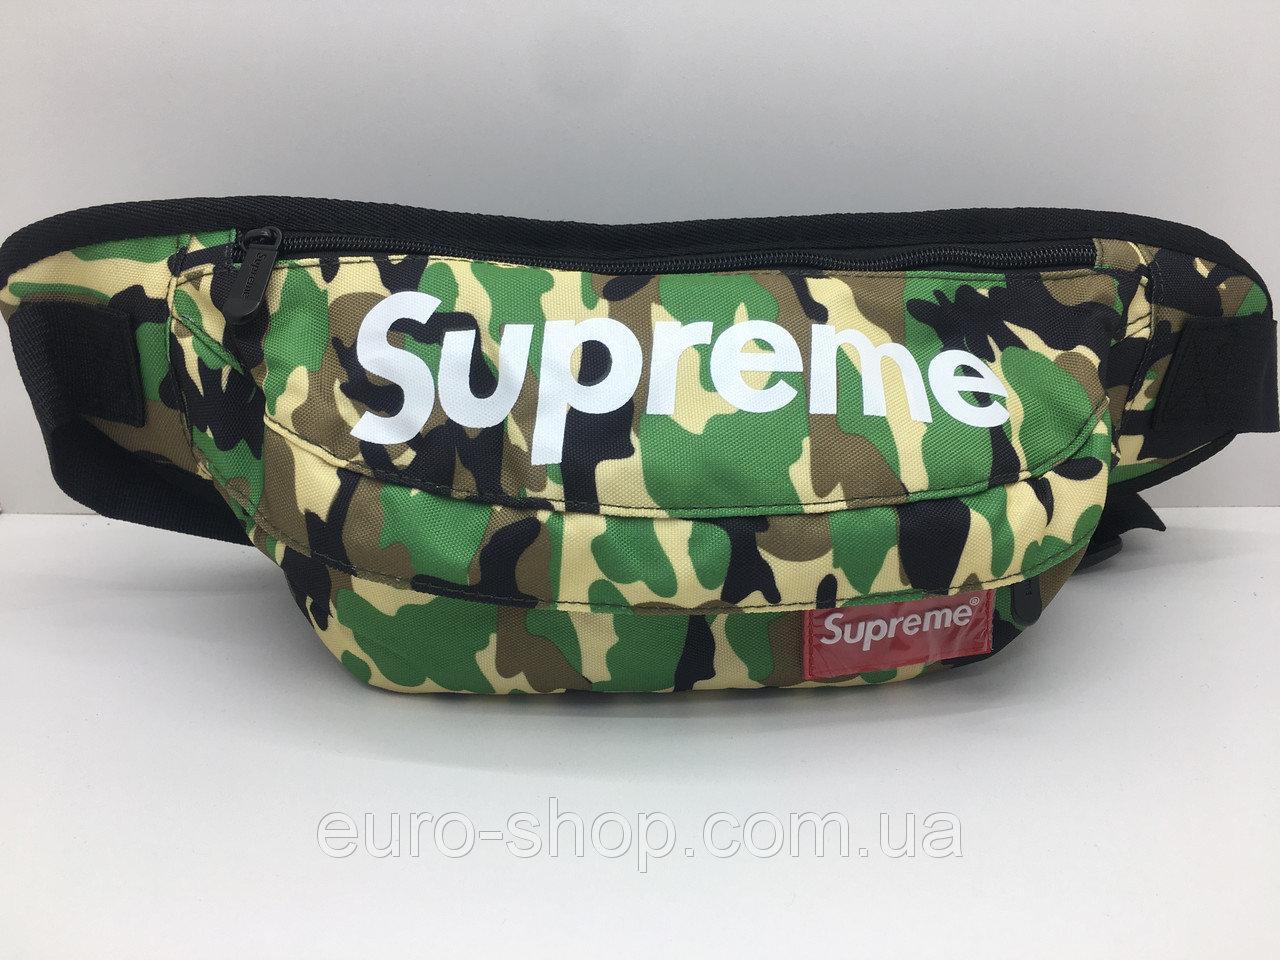 Поясная сумка Supreme КАМУФЛЯЖ сумка на пояс